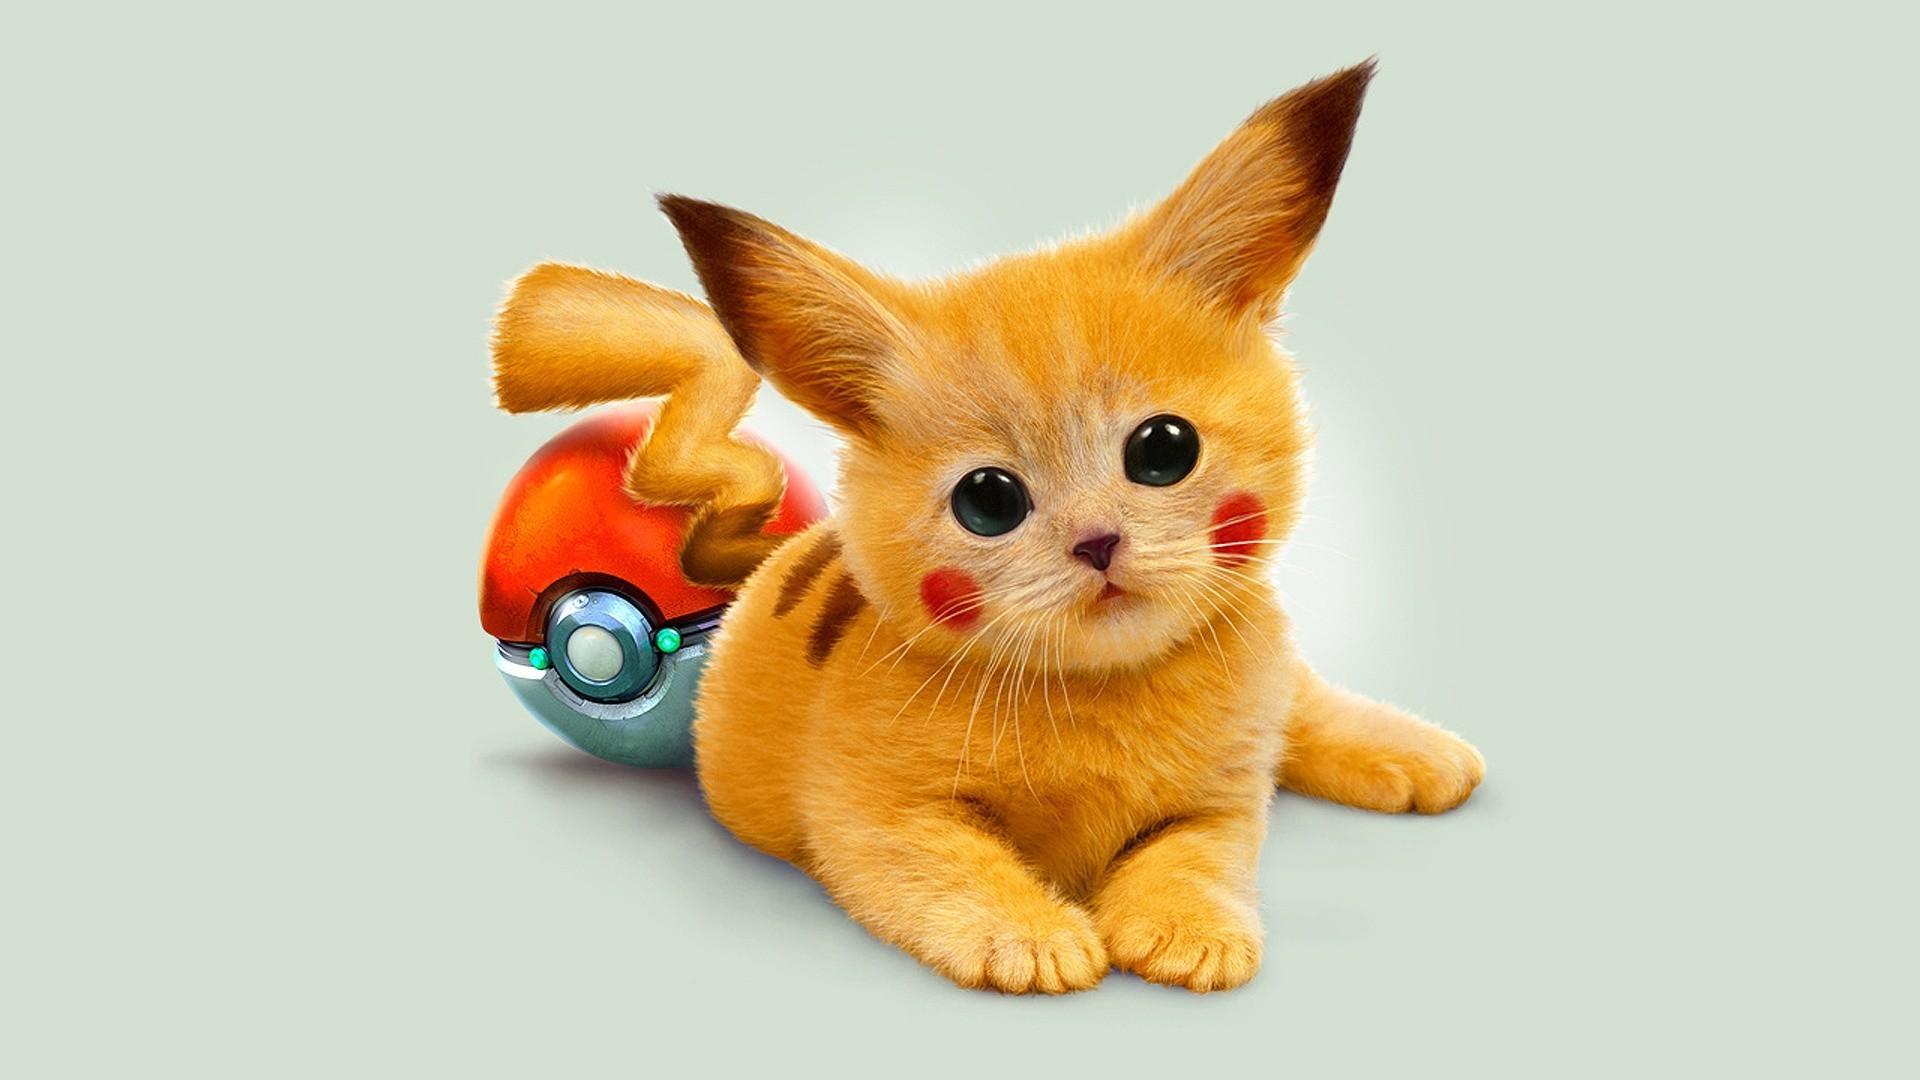 Fluffy Pokemon Pikachu